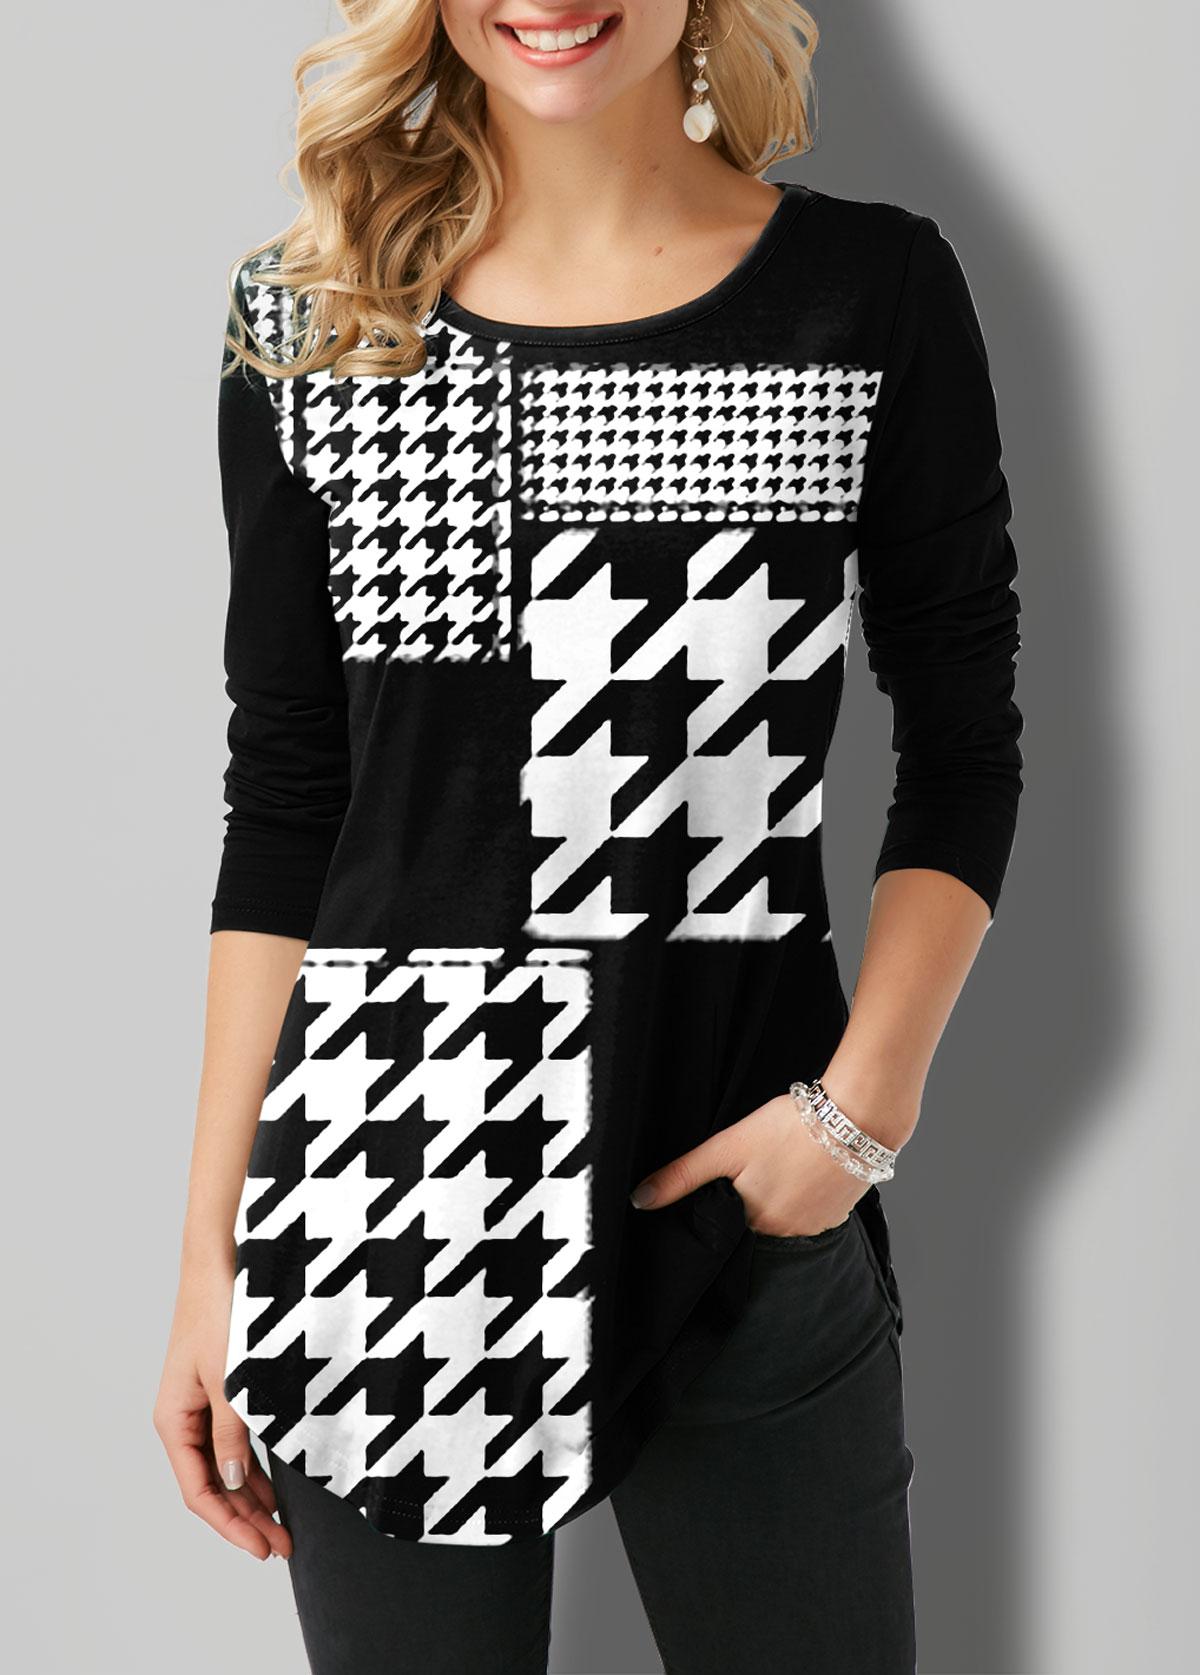 ROTITA Round Neck Houndstooth Print Long Sleeve T Shirt